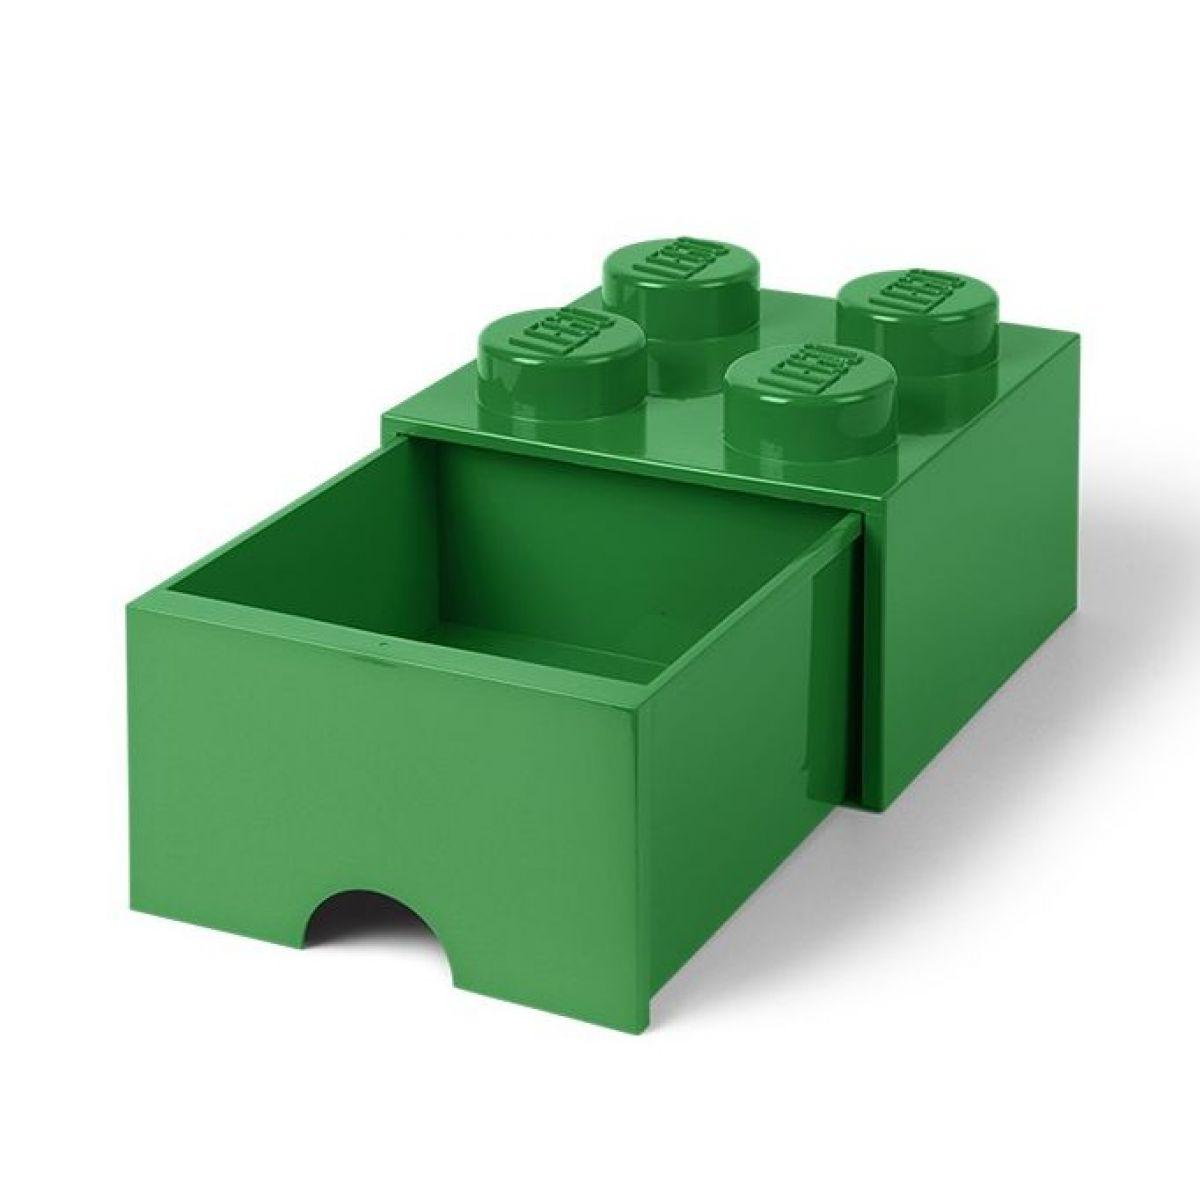 LEGO úložný box 4 s šuplíkem - Tmavě zelená